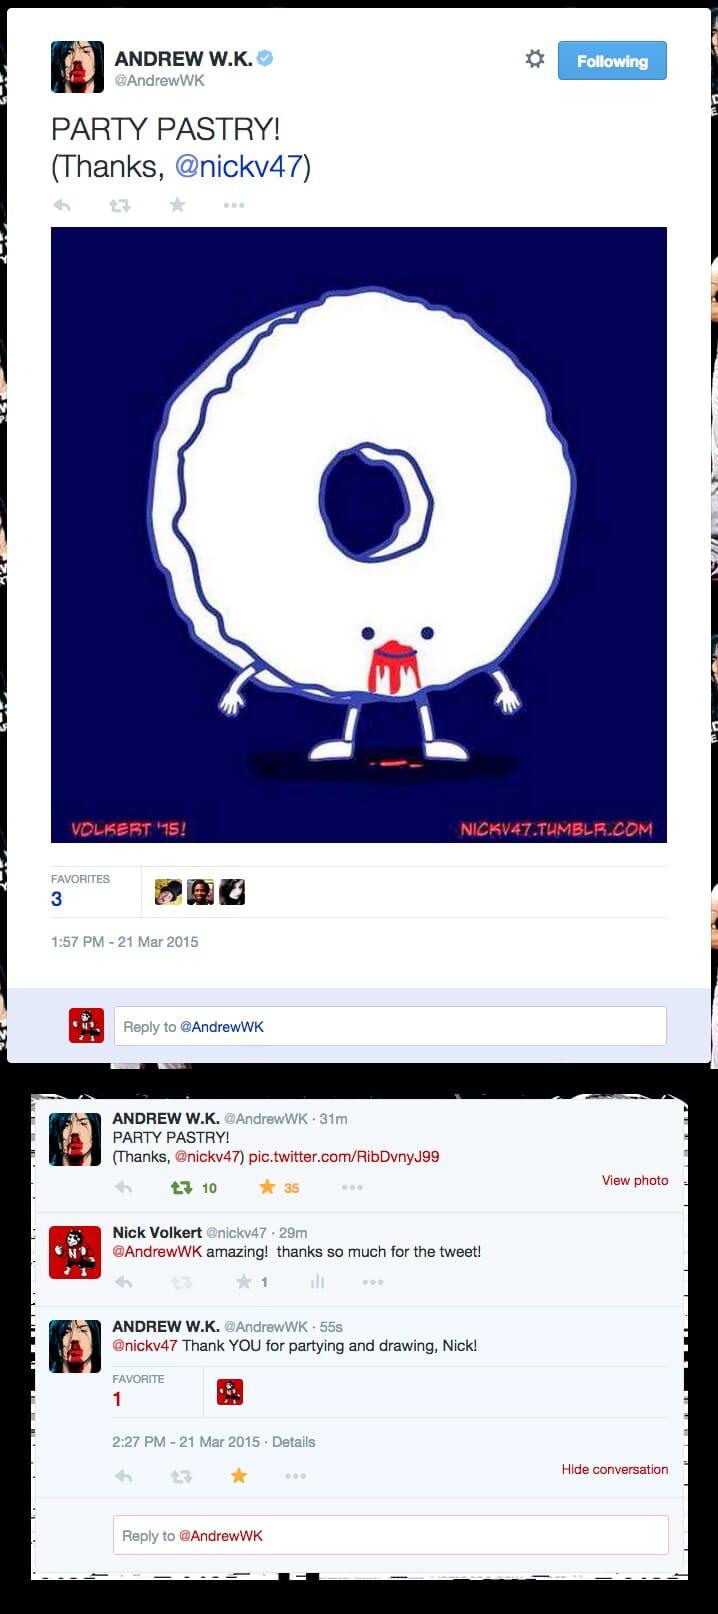 Andrew WK social media feature